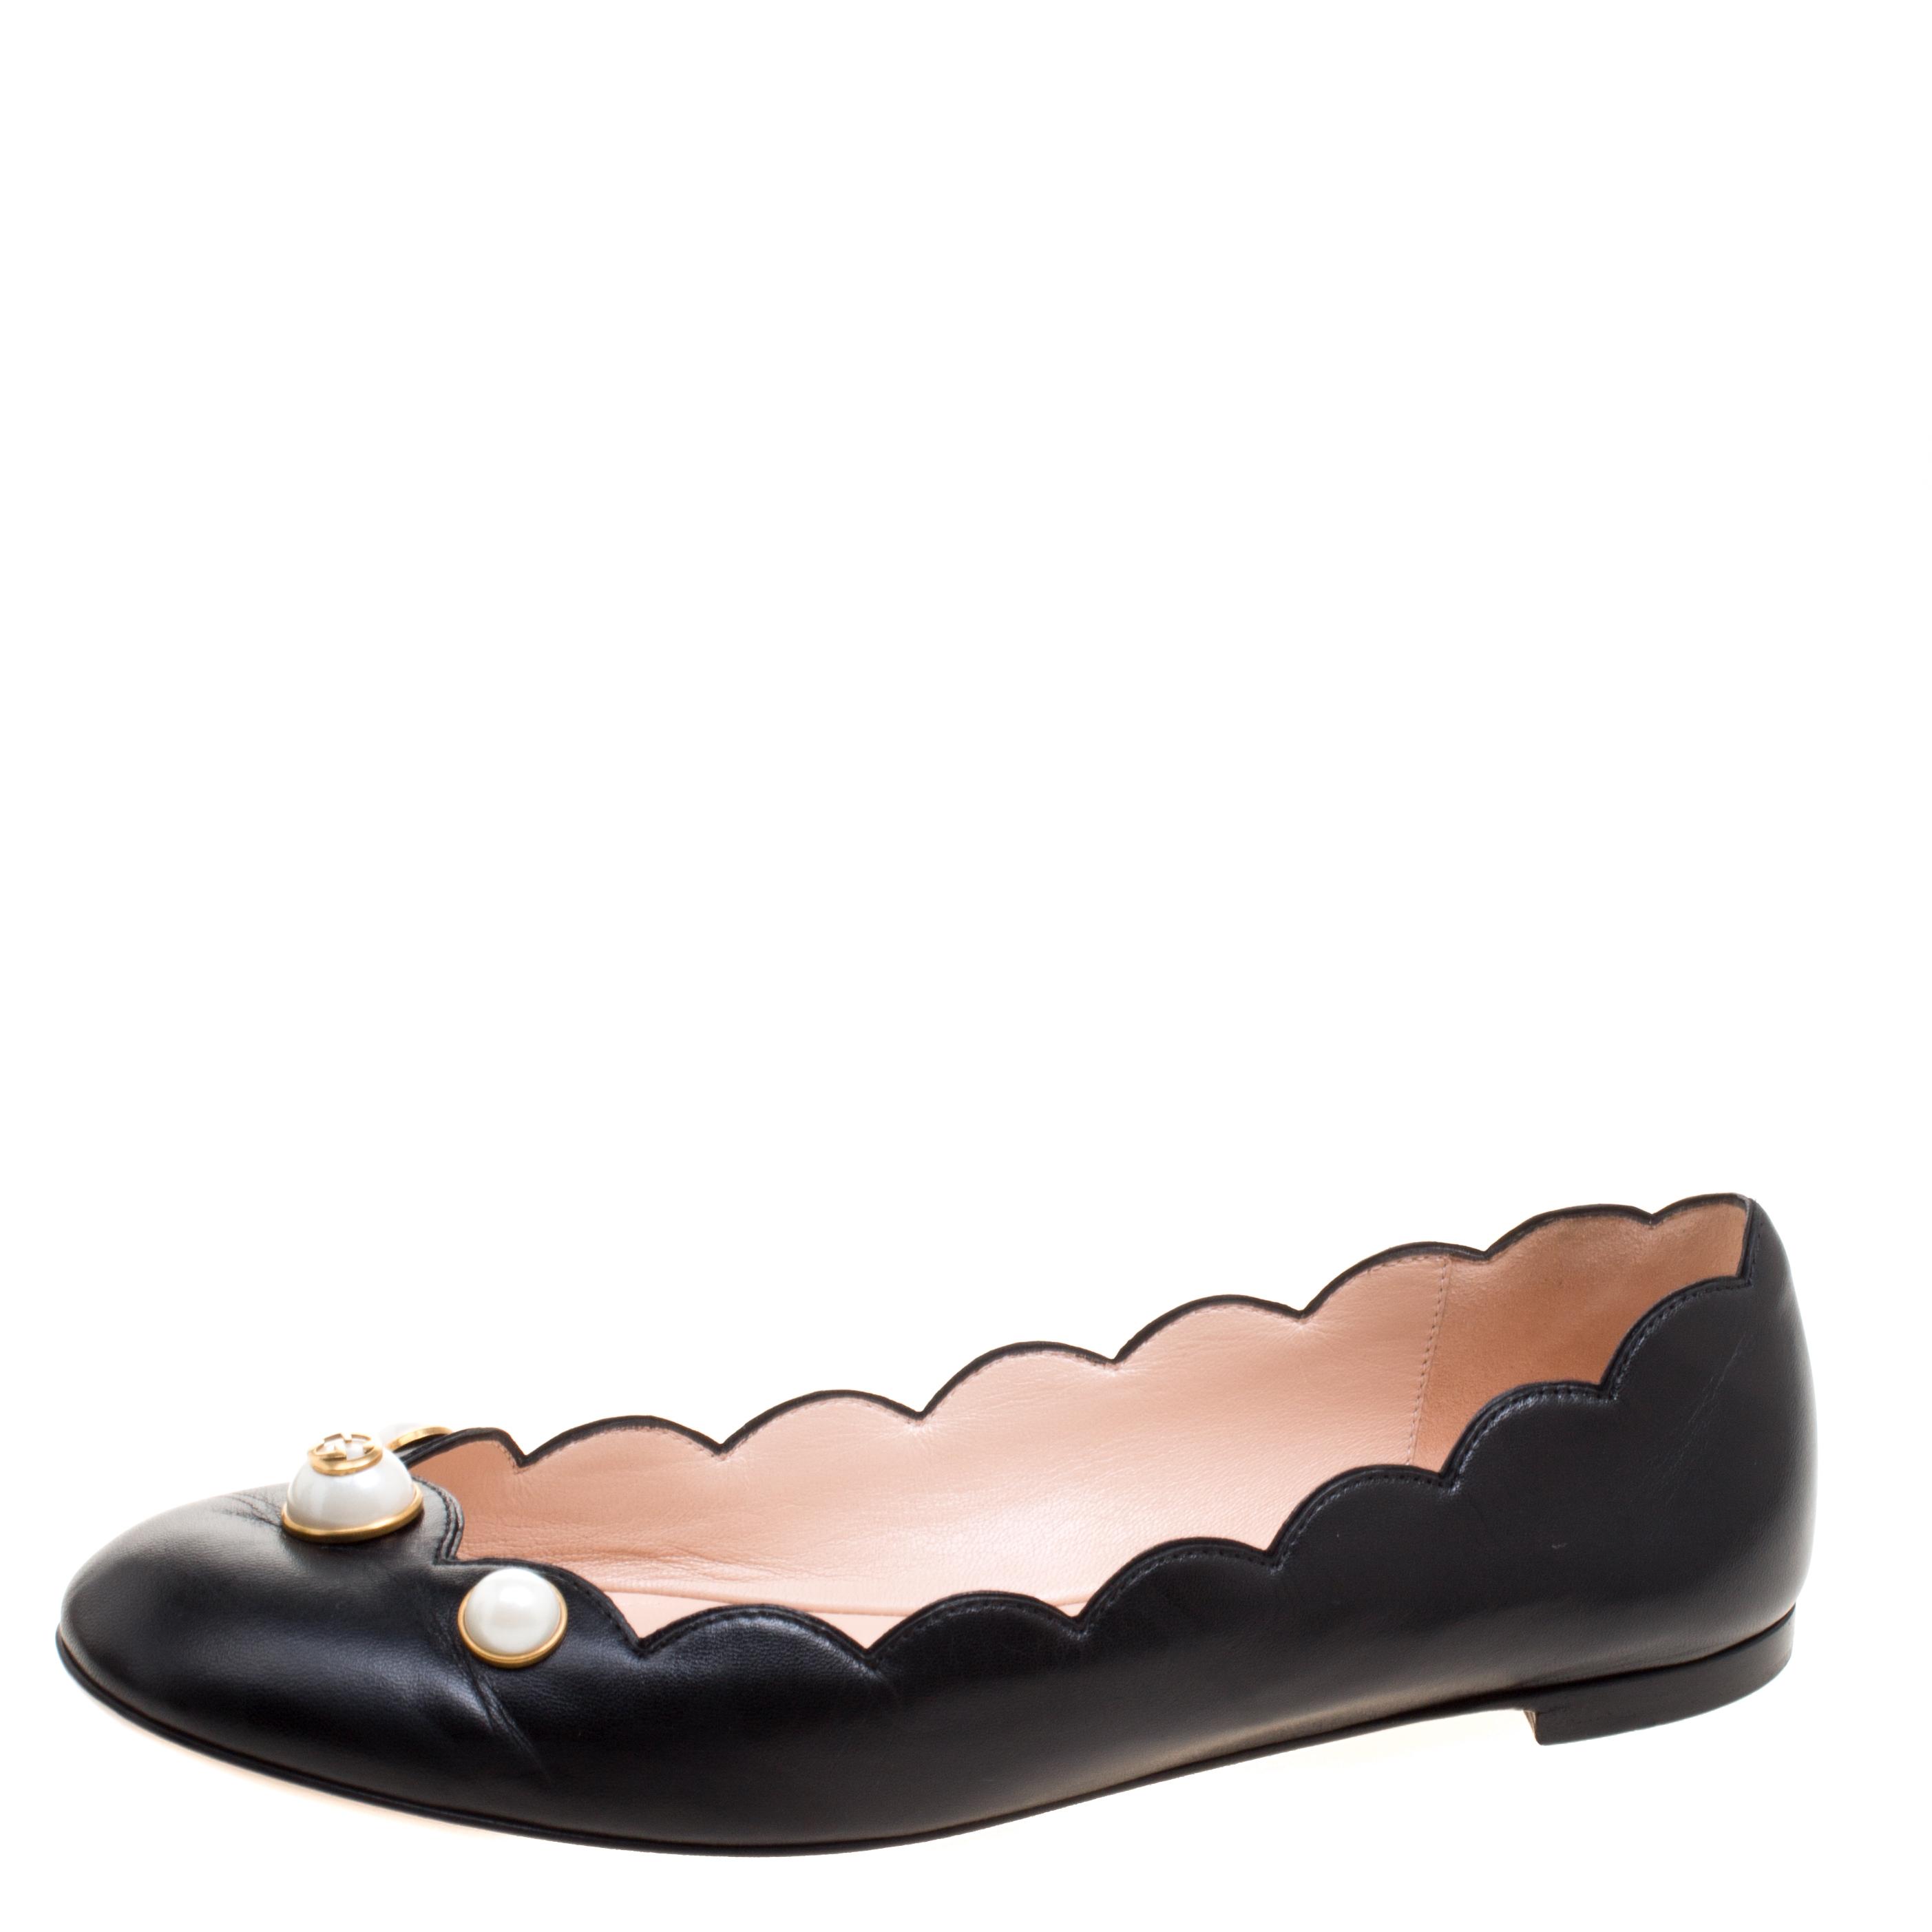 e121b9f06b3e ... Gucci Black Leather Willow Scalloped Ballet Flats Size 39. nextprev.  prevnext